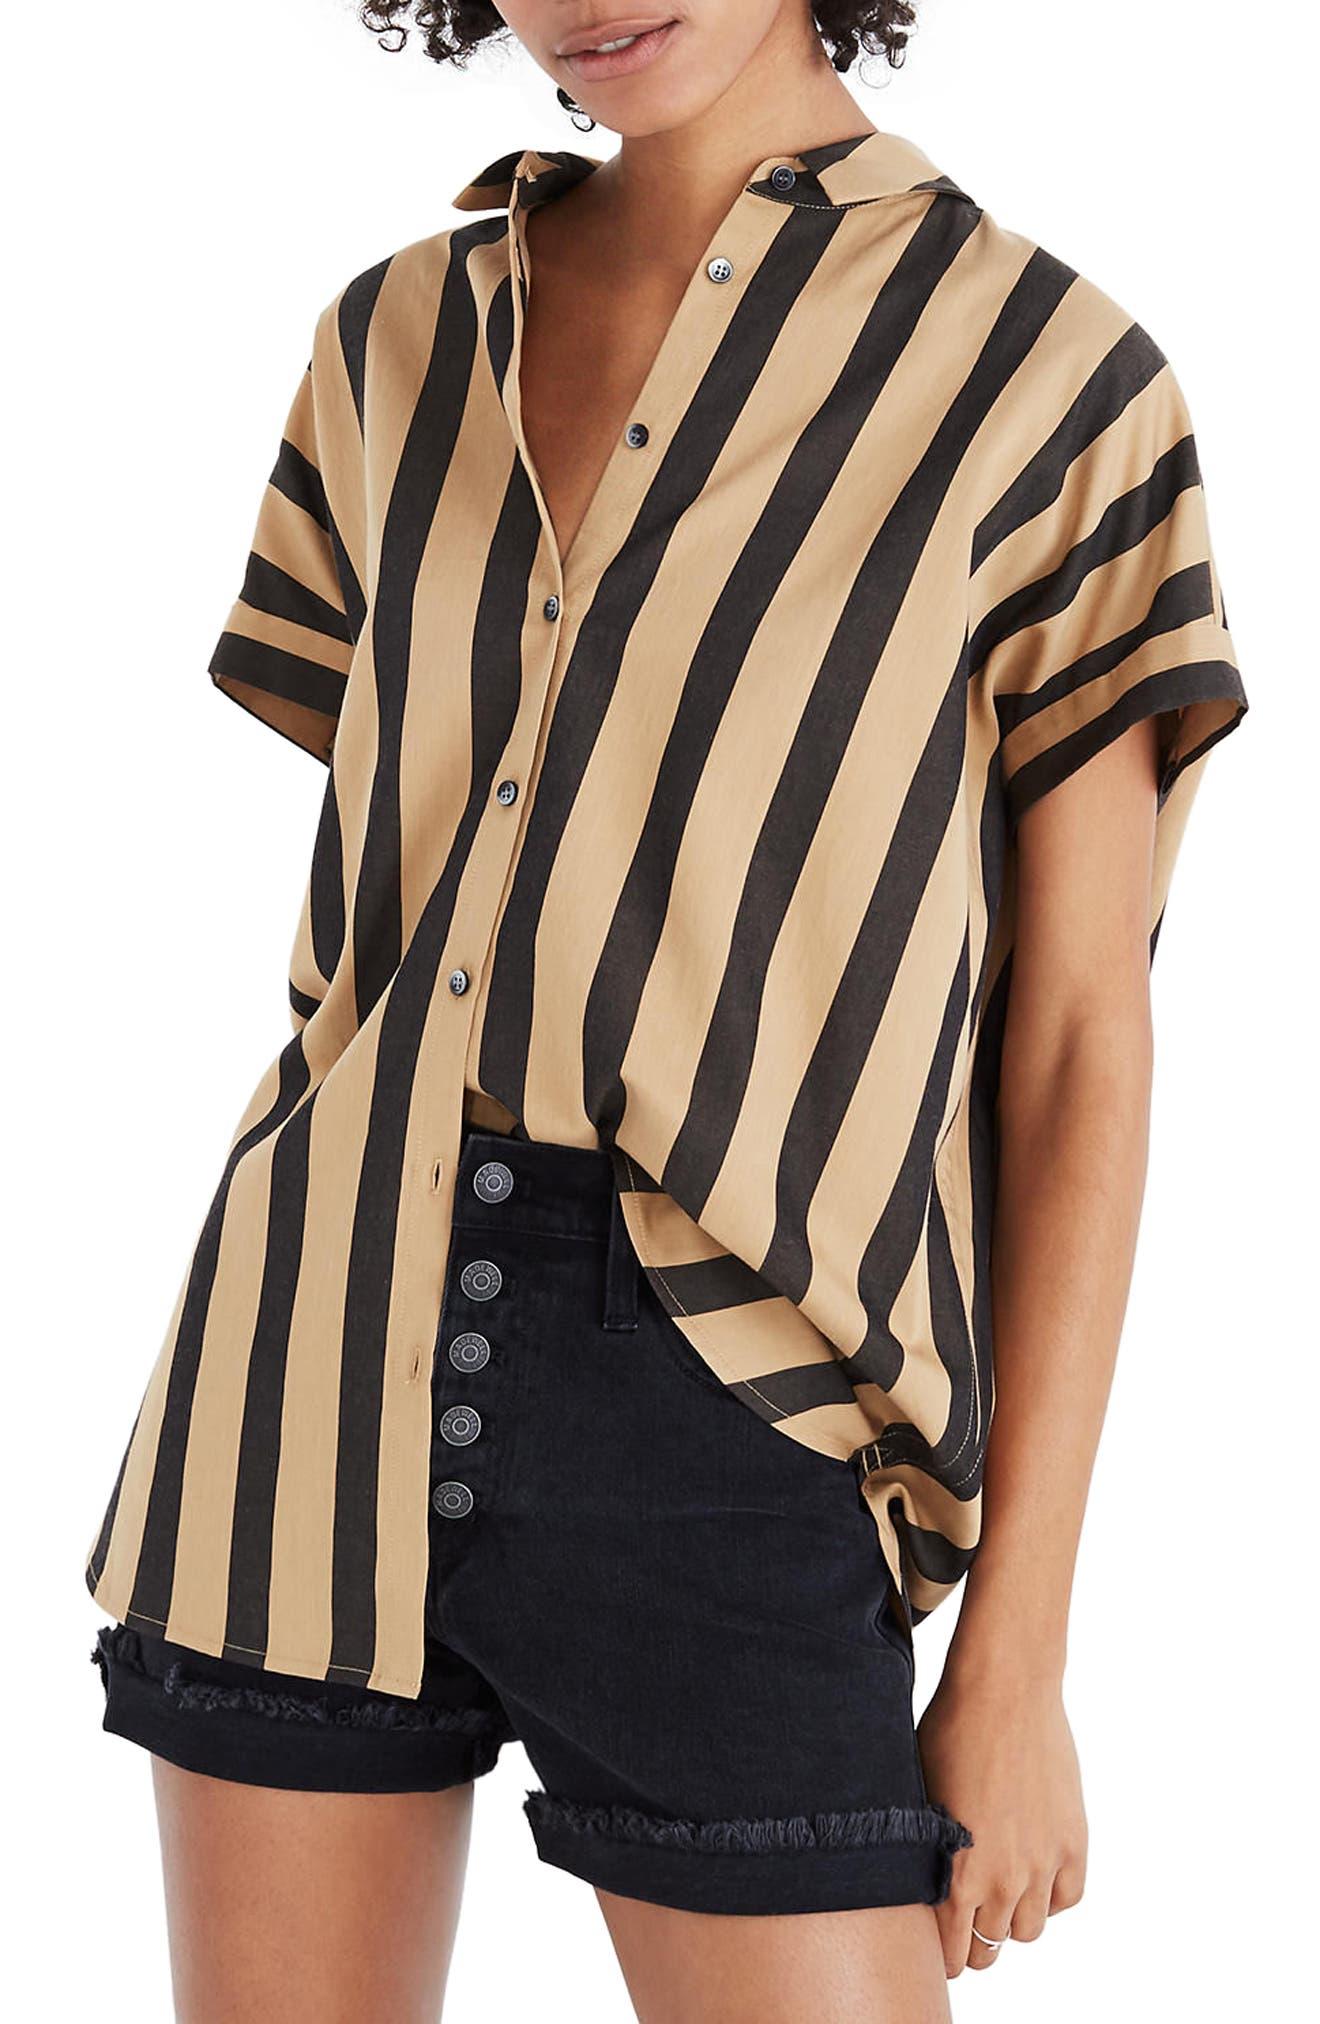 Main Image - Madewell Central Edna Stripe Shirt